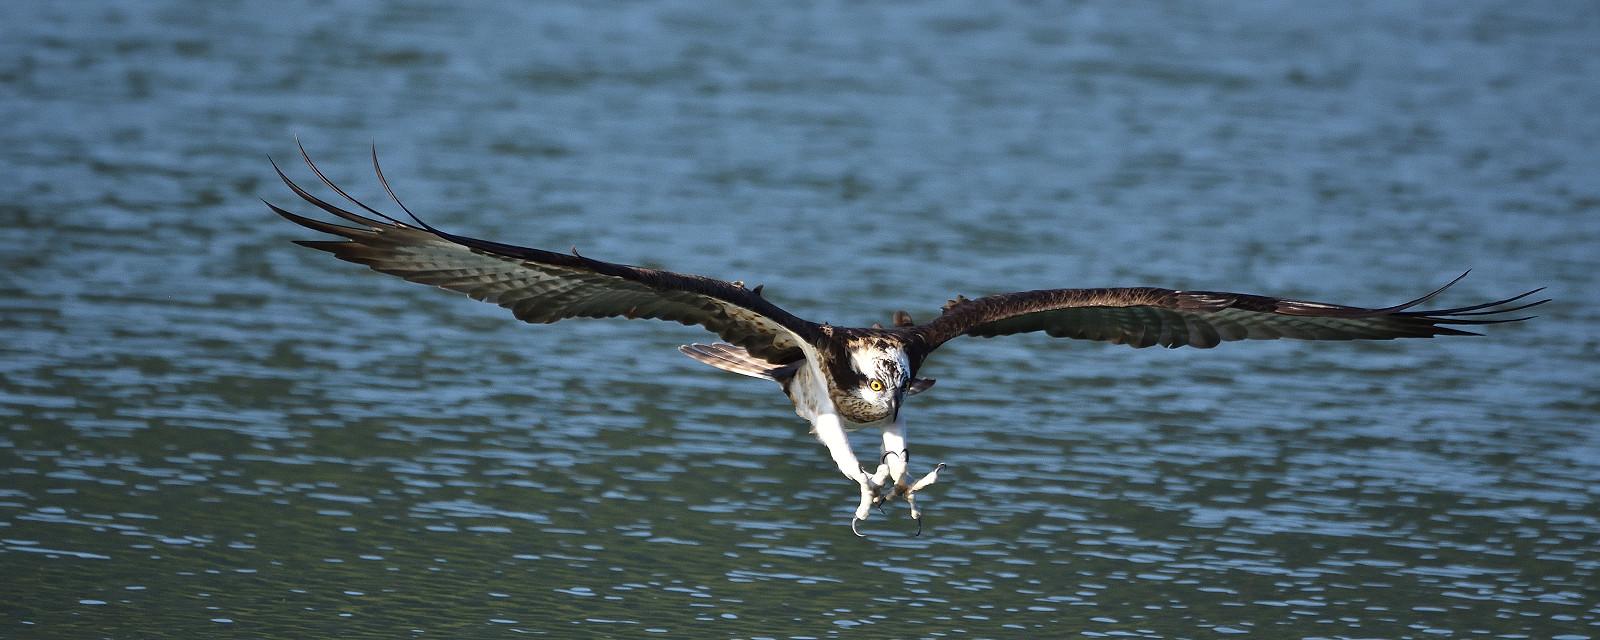 Osprey_1591_L